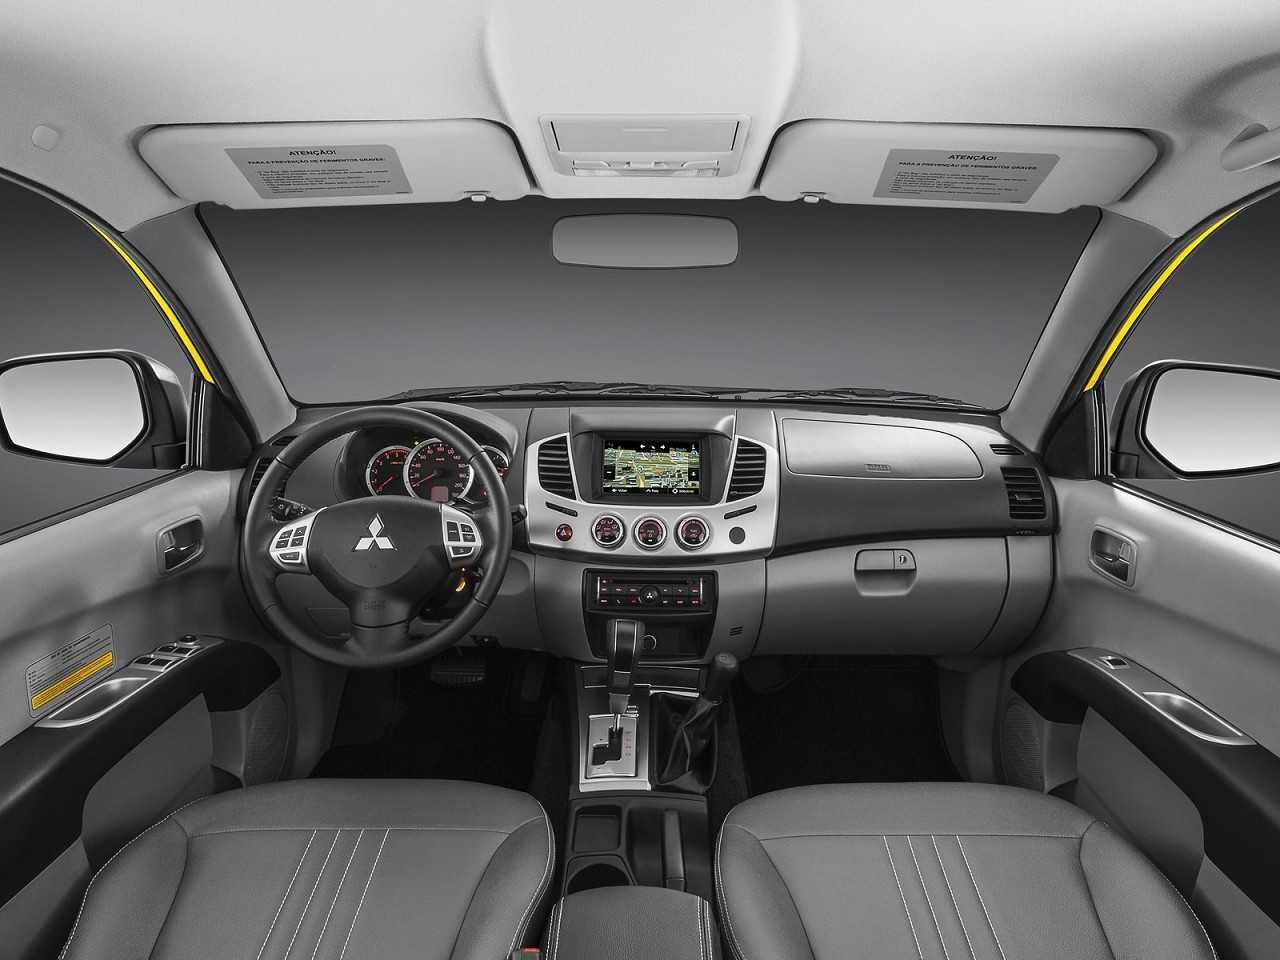 MitsubishiL200 Triton 2017 - painel